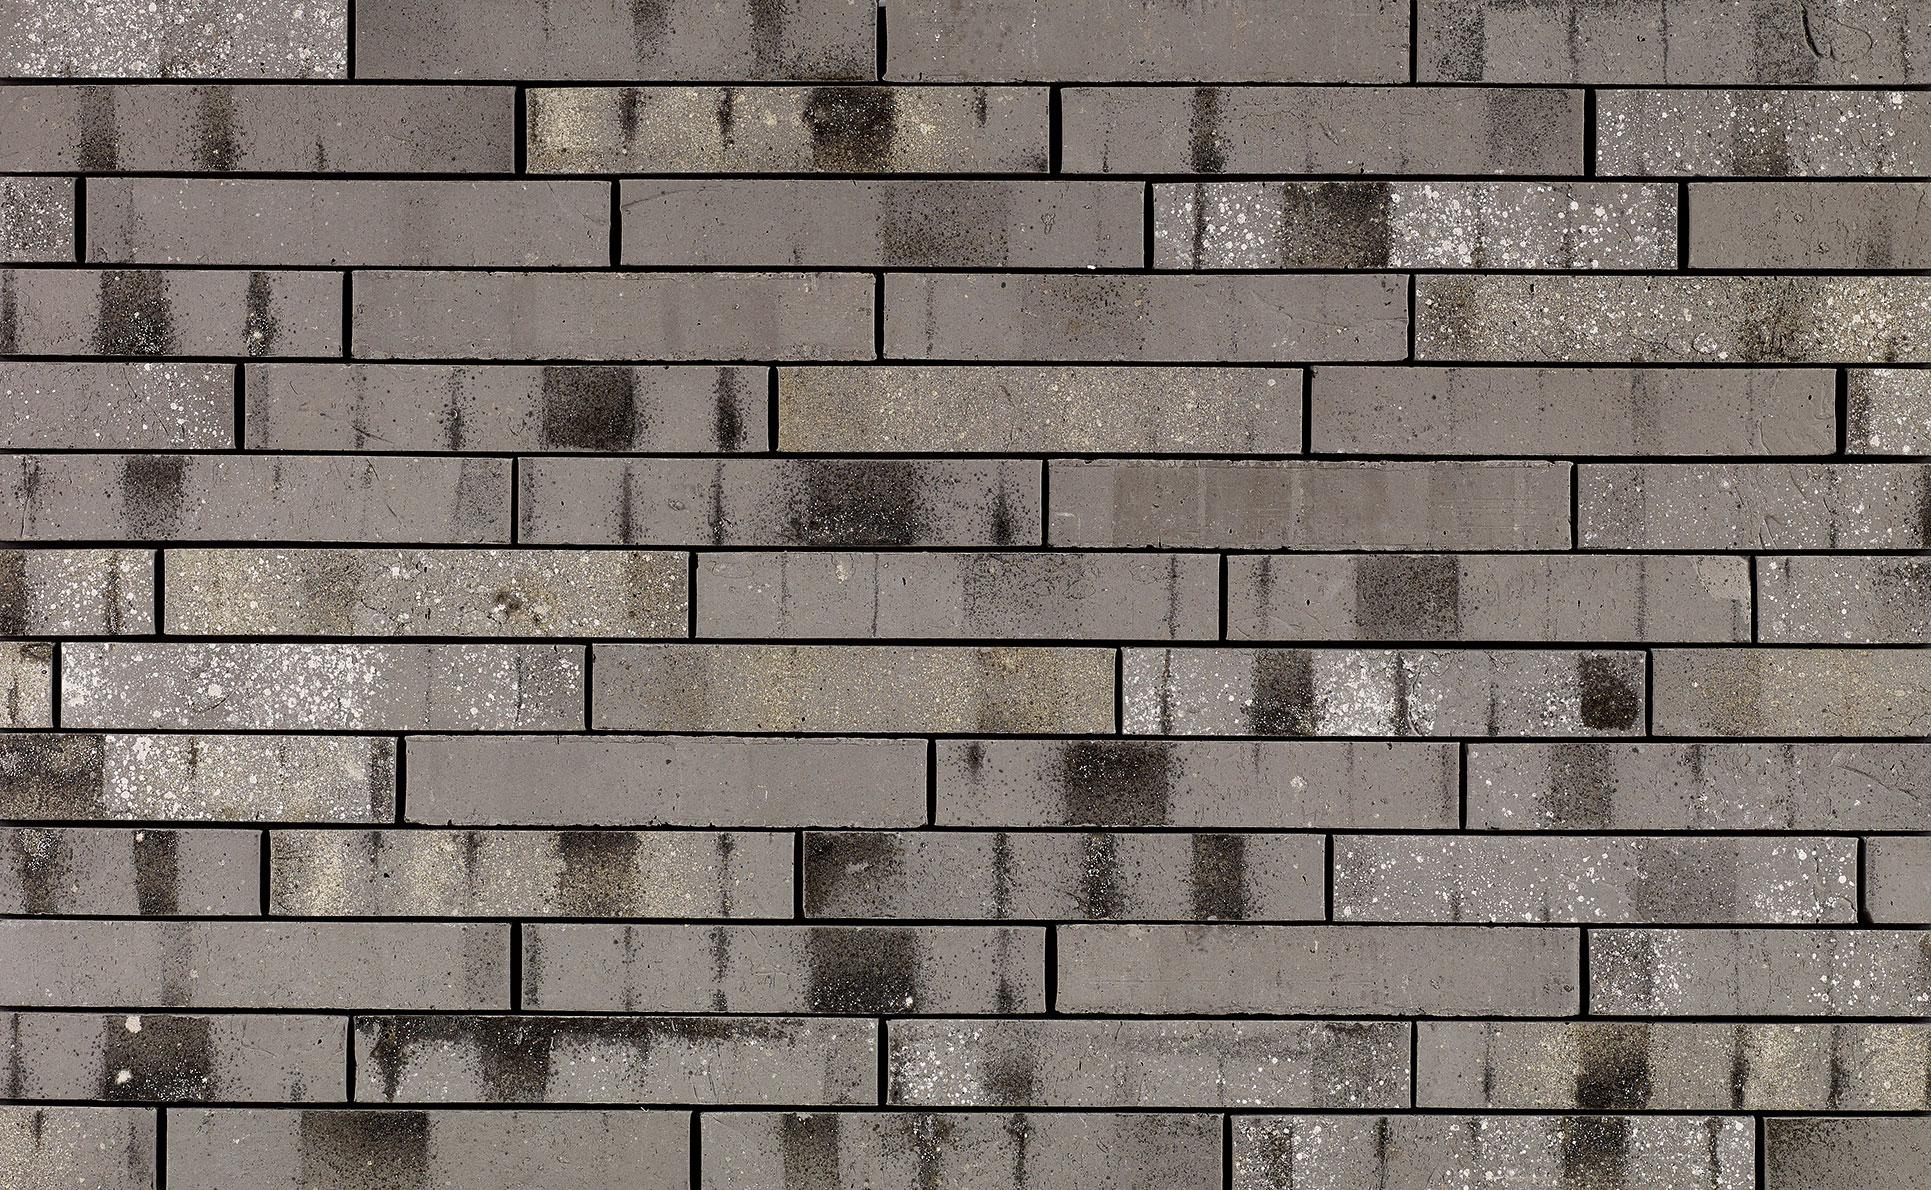 ditail-materiales-wienerberger_ter_2018_archipolis-jet-grijs_crop-cmyk_001